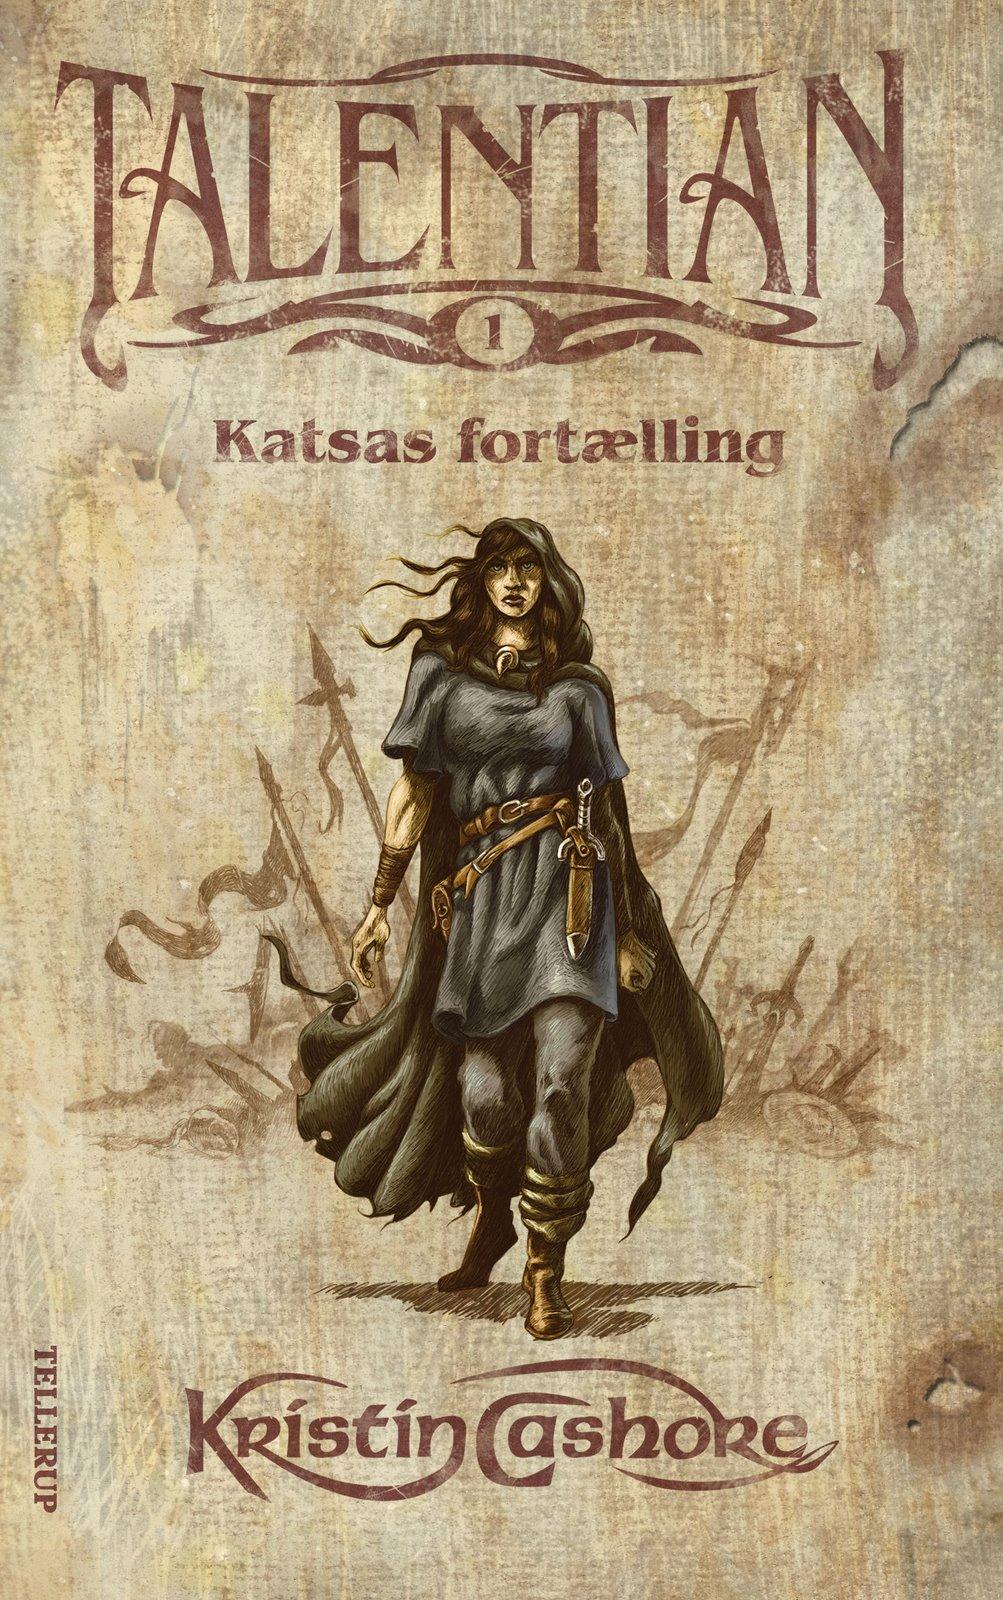 Graceling, Kristin Cashore, Seven Kingdoms, Katsa, Po, eye, knife, dagger, fantasy, fantasy YA, Young adult